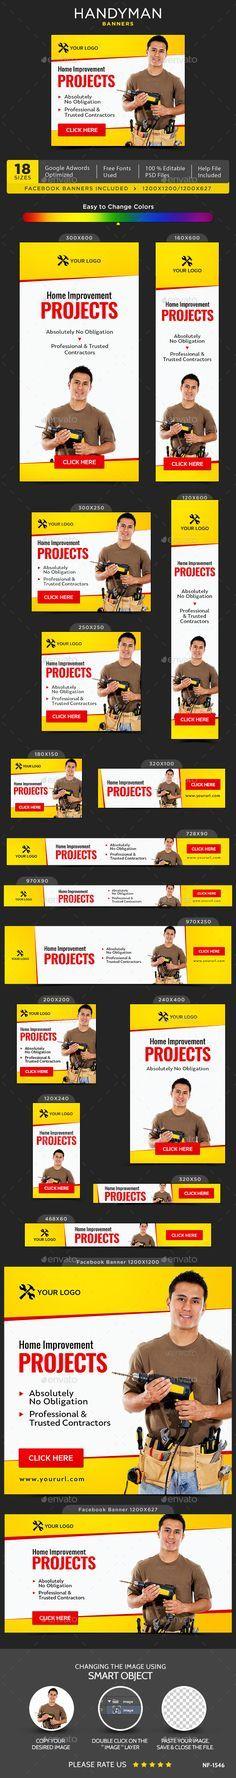 Image result for home improvement web ads